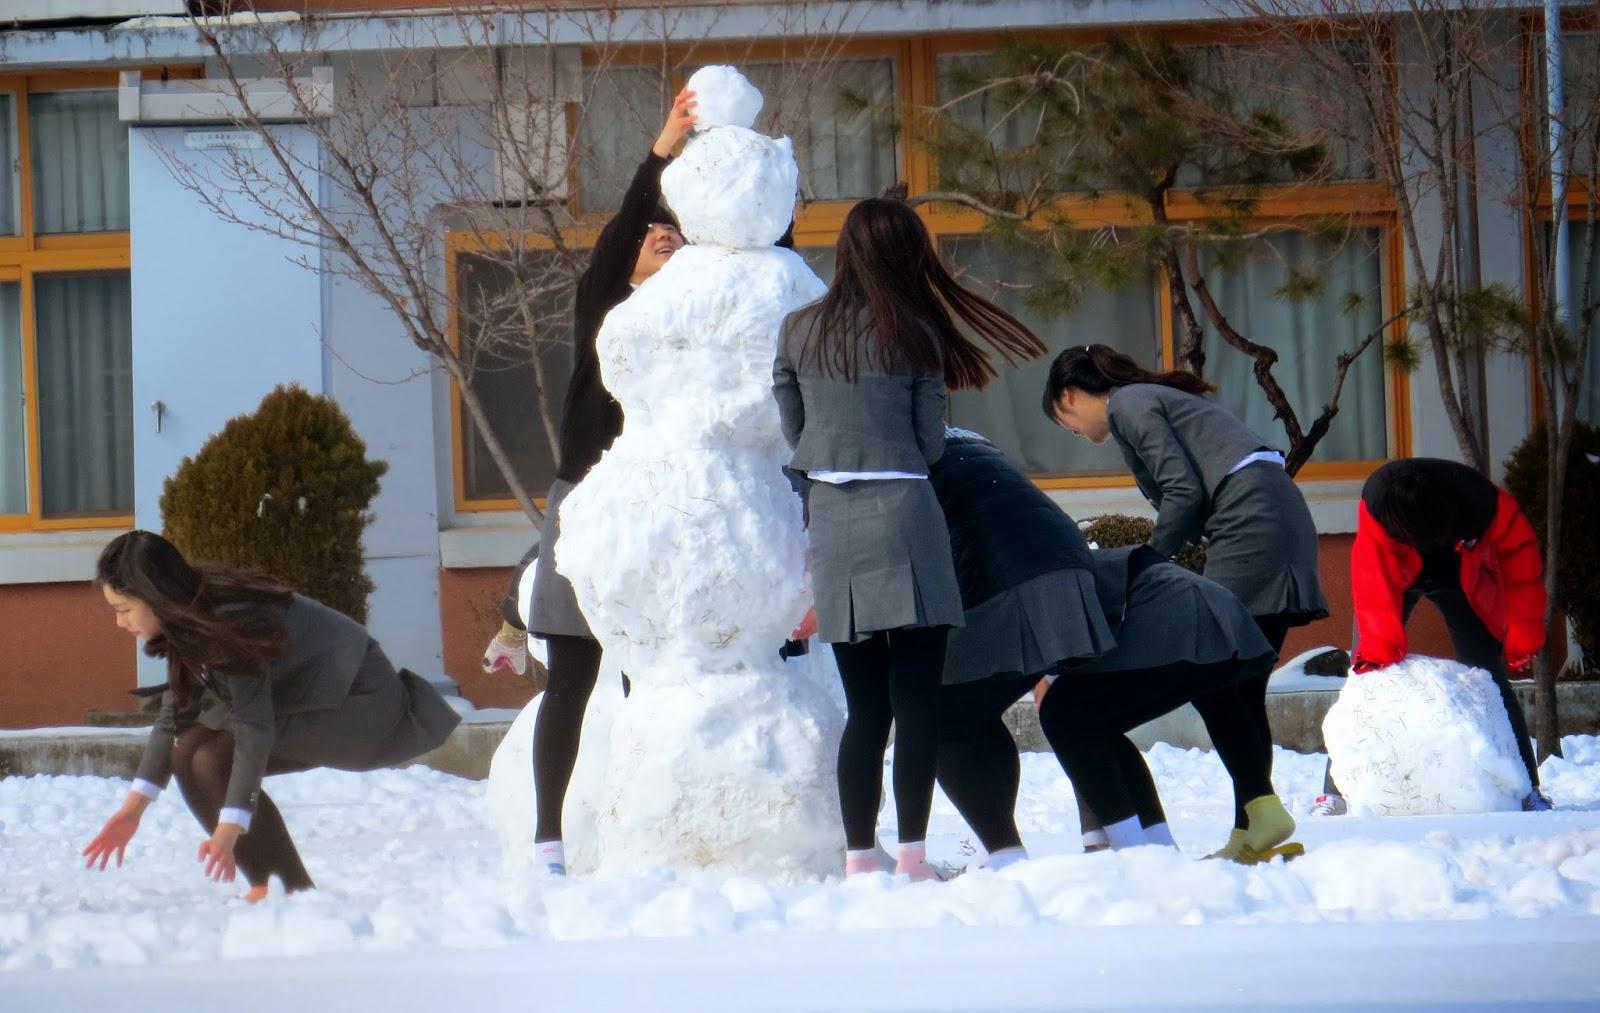 KOREA - Students building a snowman over lunch break